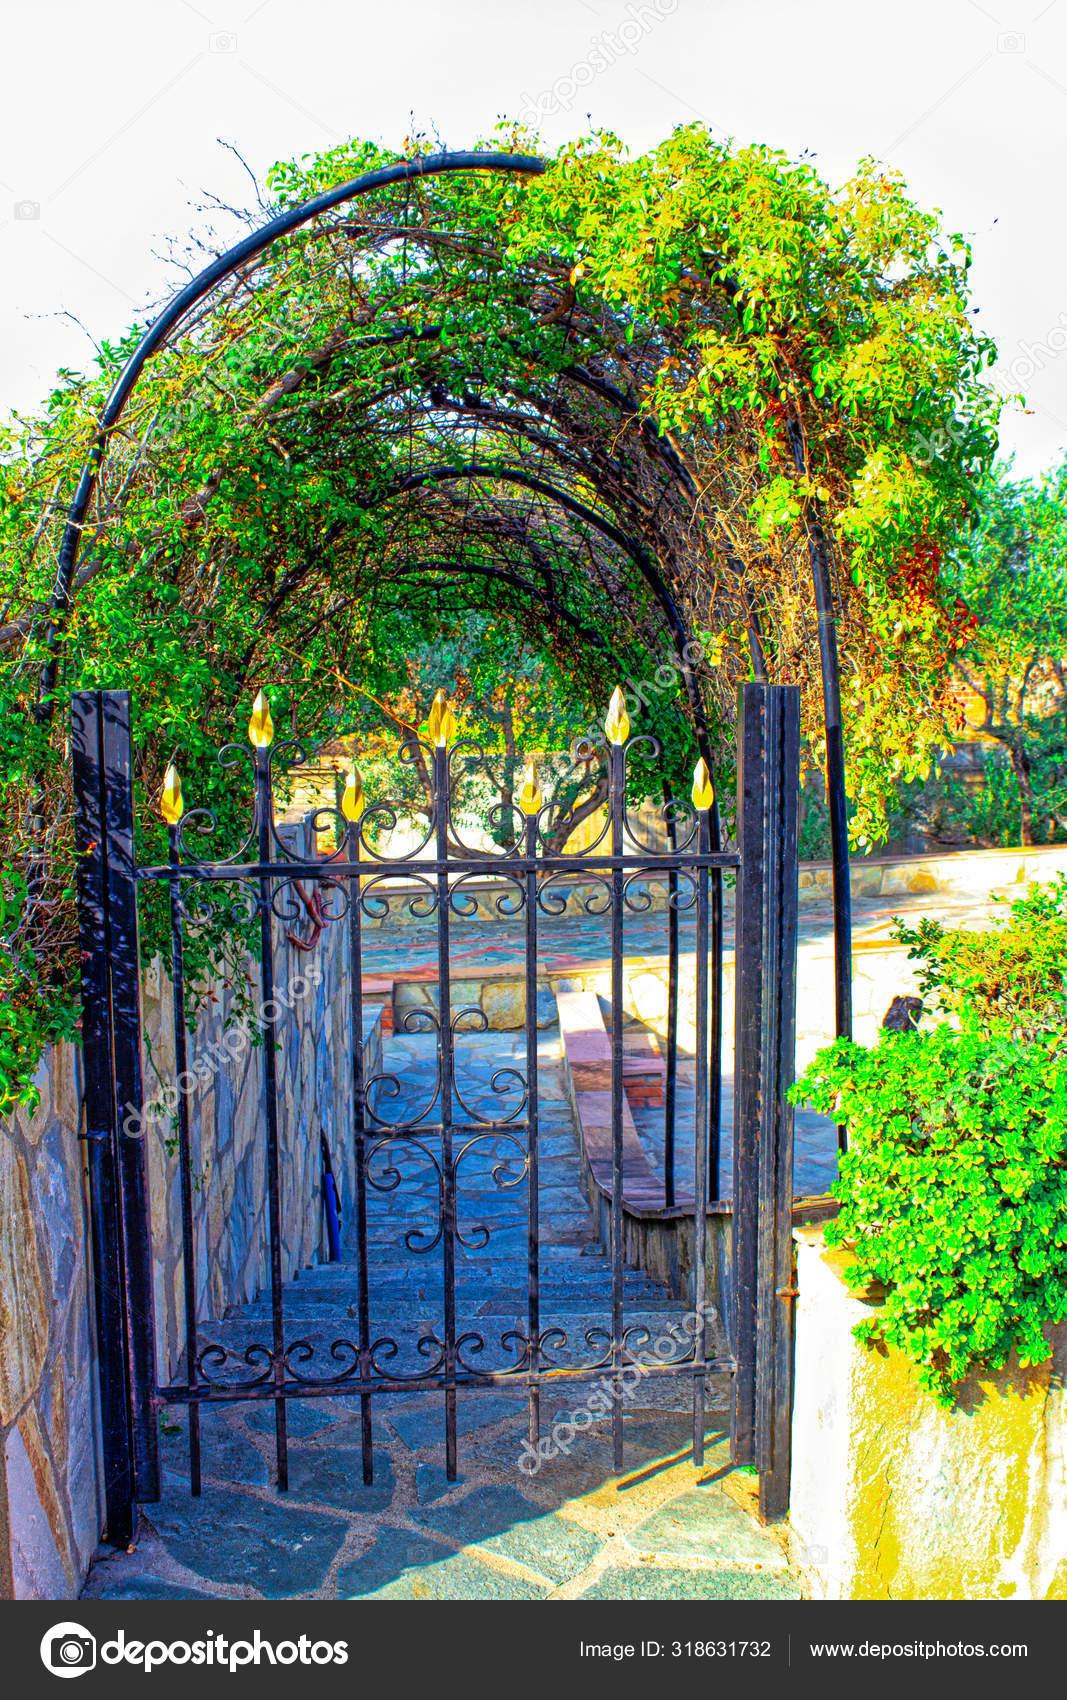 Garden Metal Door Steel Fence Residential House Modern Style Art Stock Photo C Fatamorgana 999 318631732